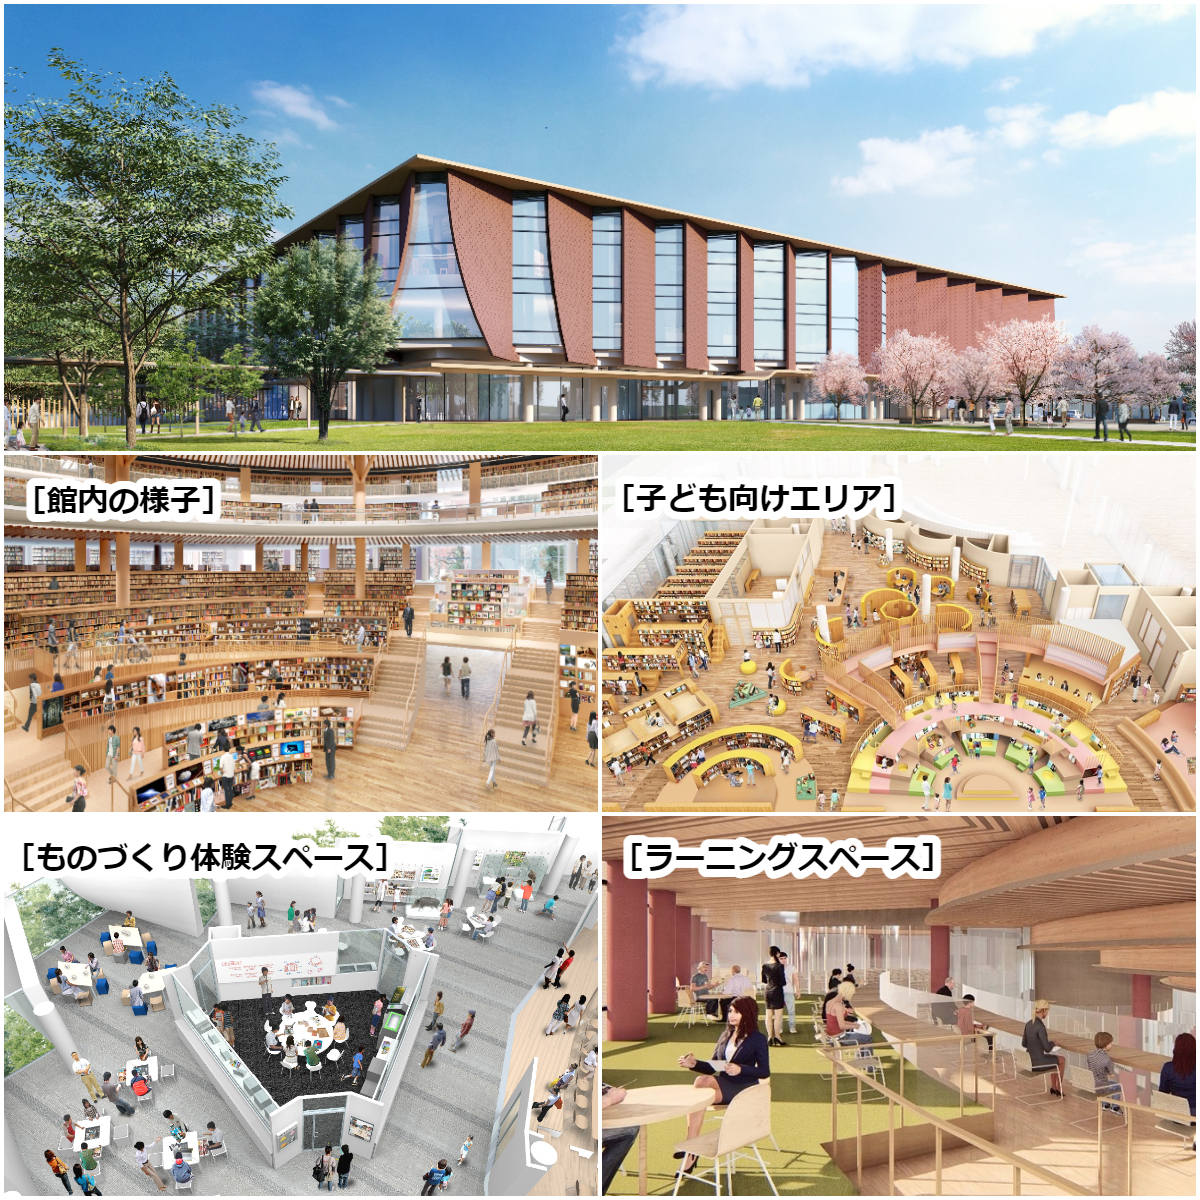 新石川県立図書館の愛称を募集中。